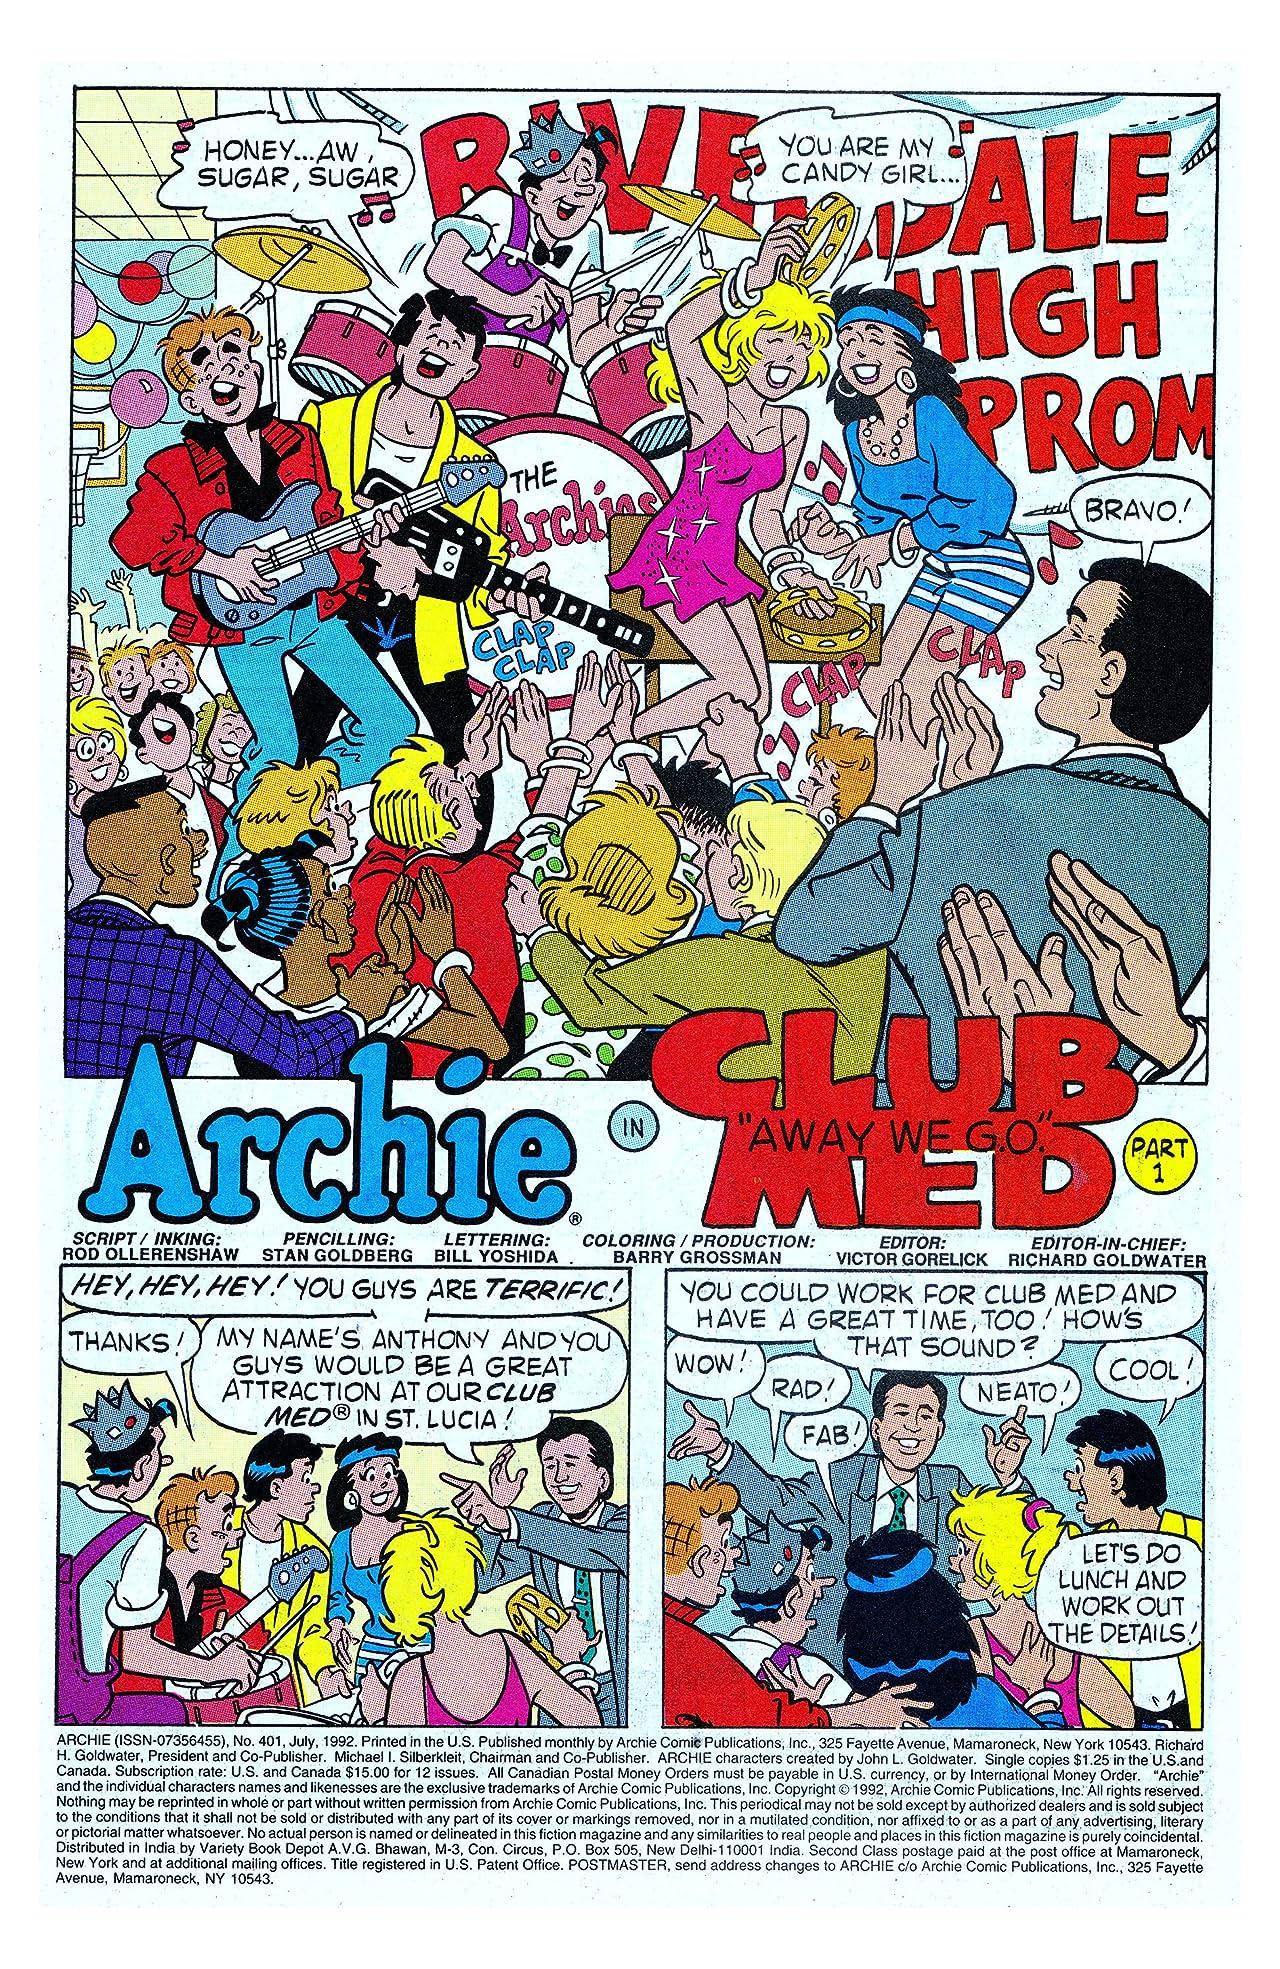 Archie #401